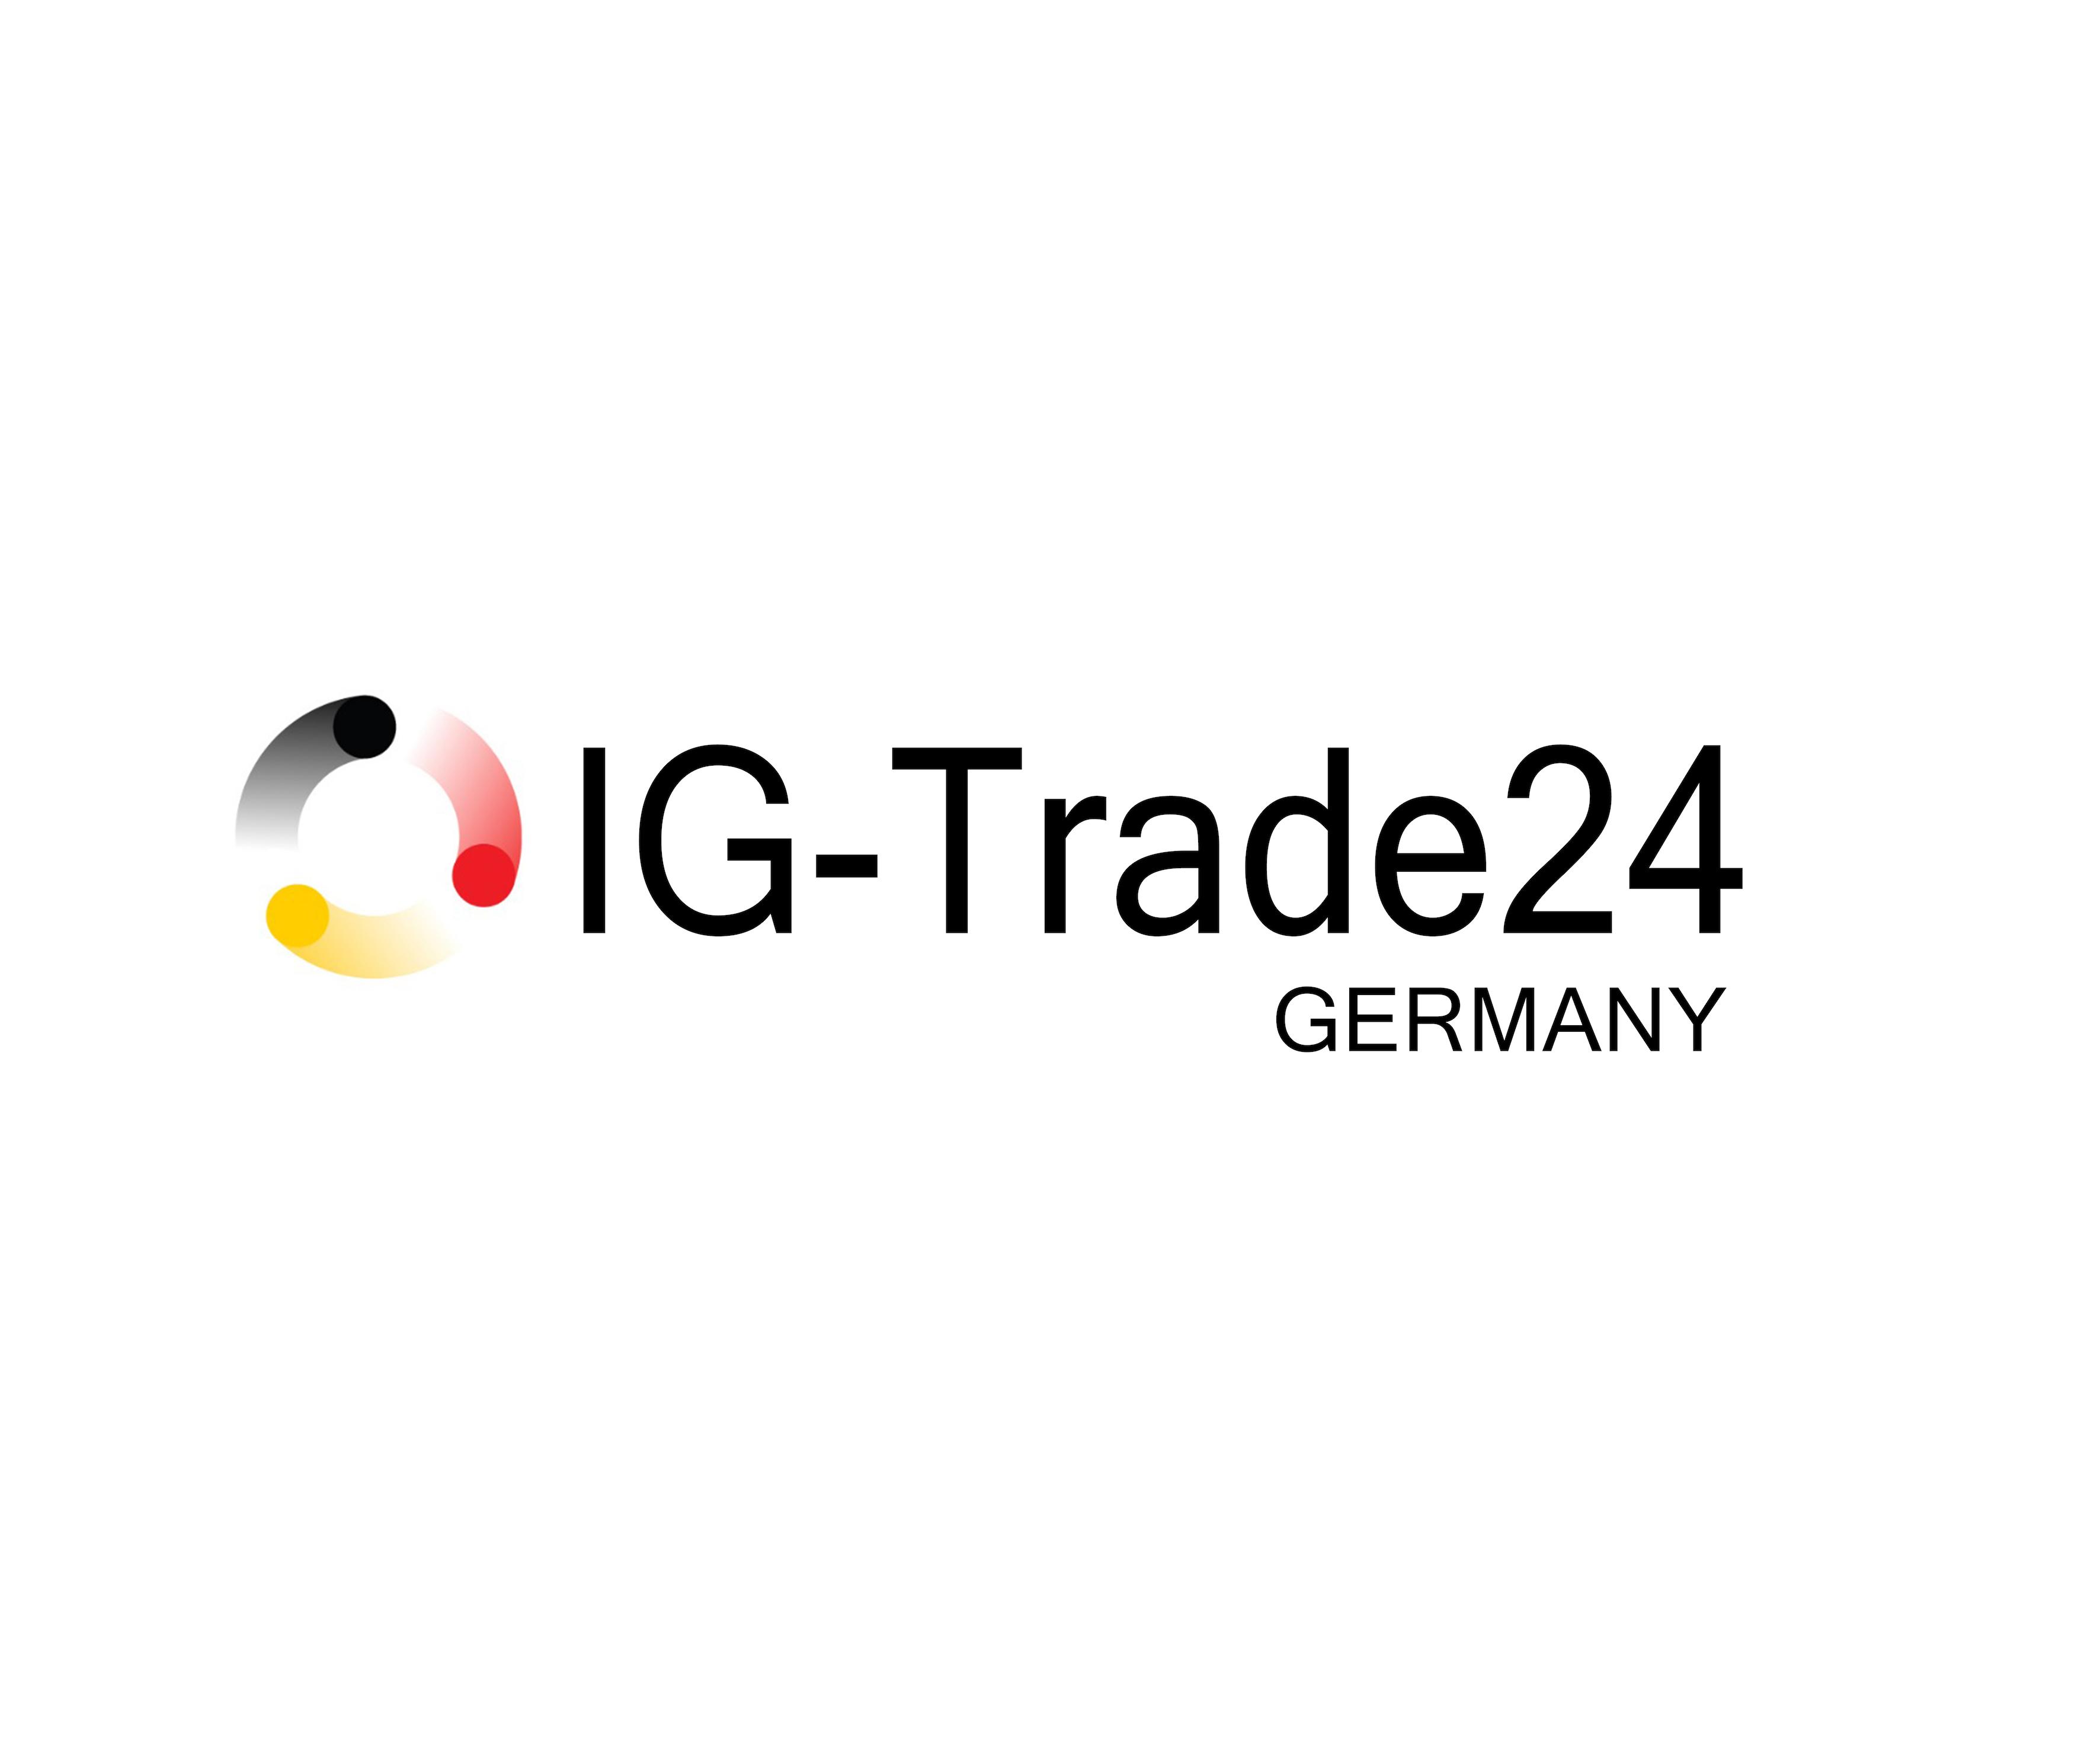 Ig-Trade24